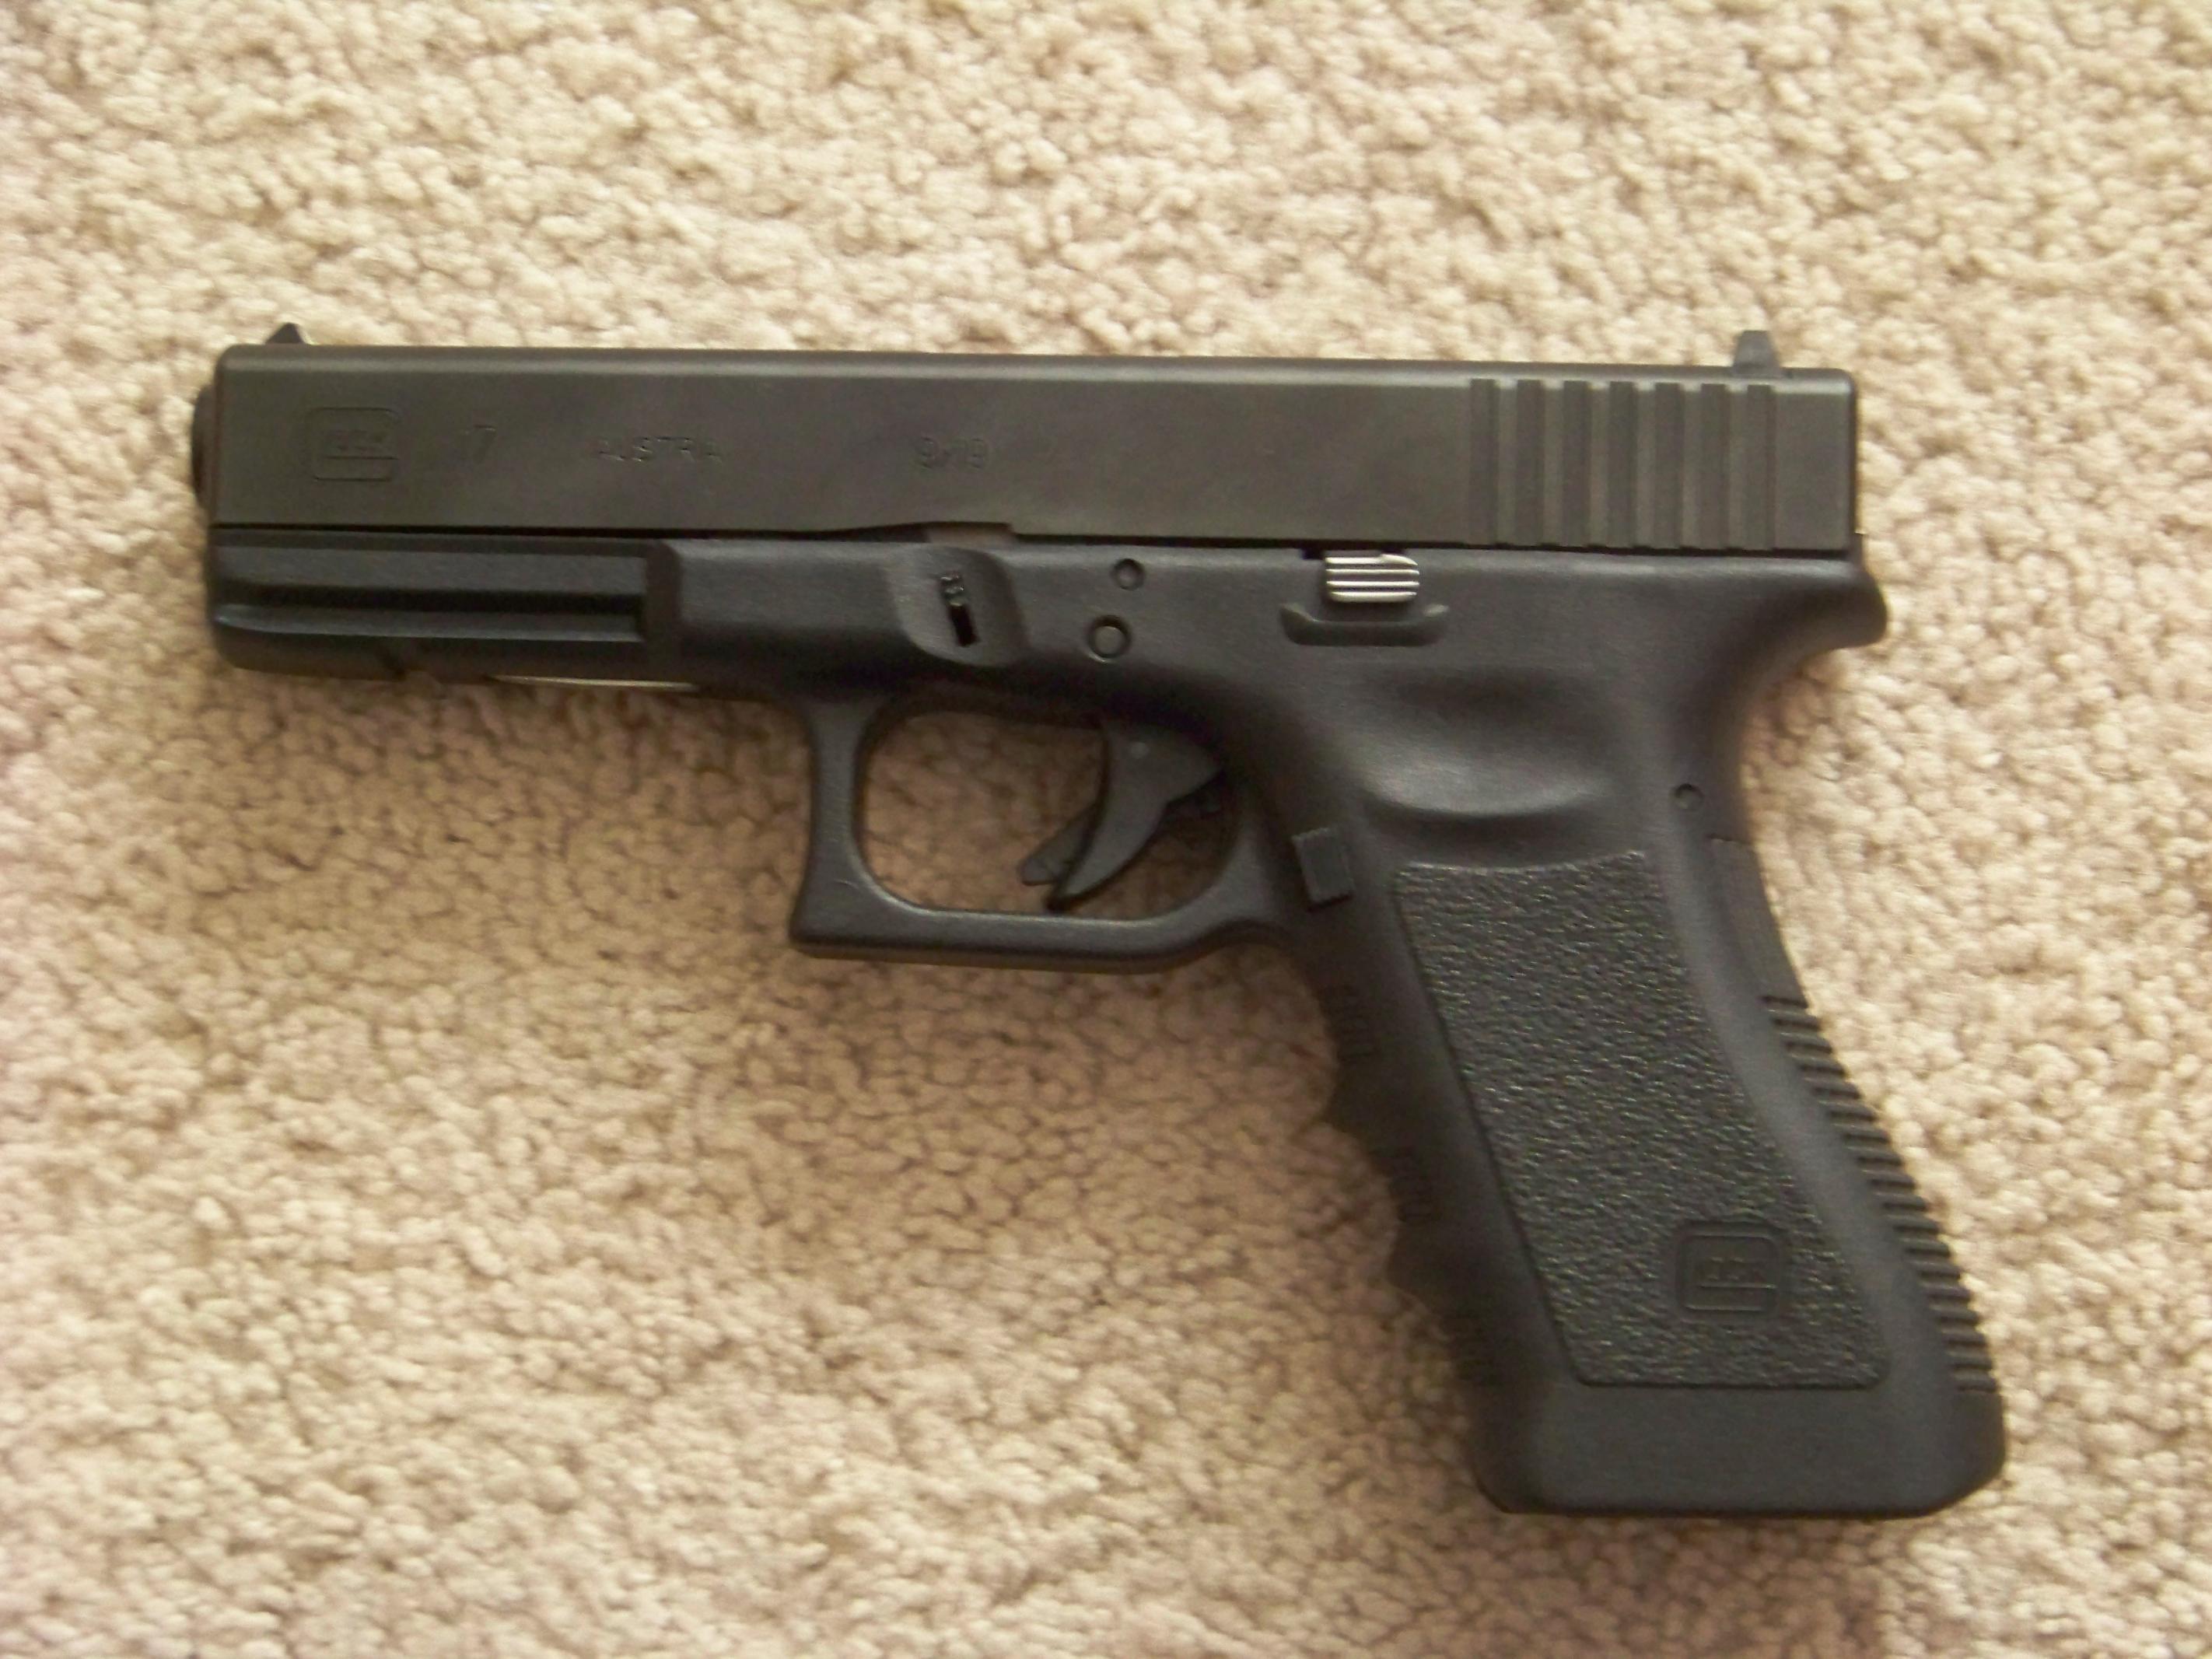 My new PT145 - what Generation?-glock.jpg